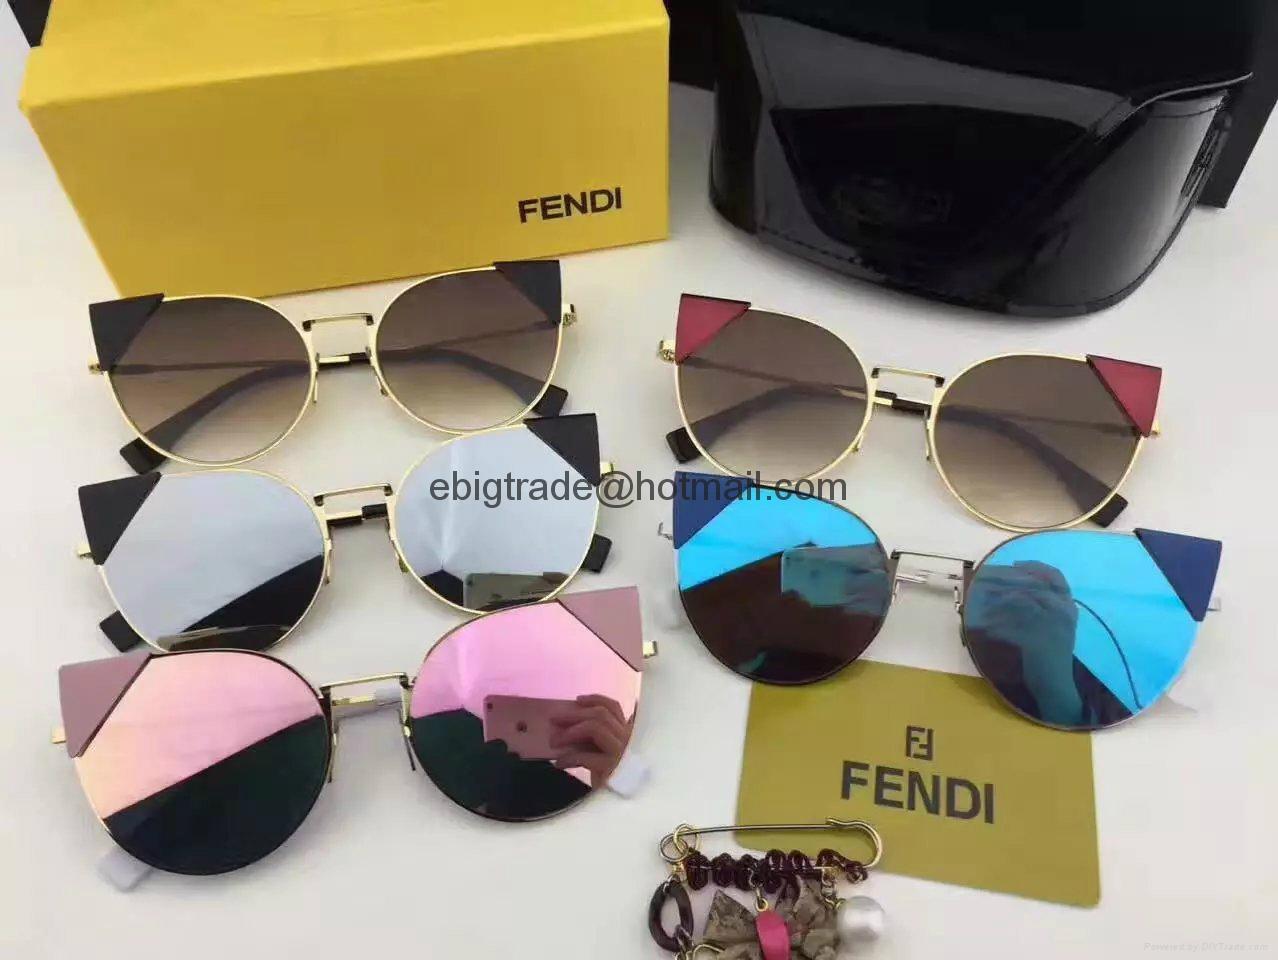 a300dfc8a92 Cheap Fendi sunglasses for women Replica Fendi Sunglasses for sale Fendi  outlet